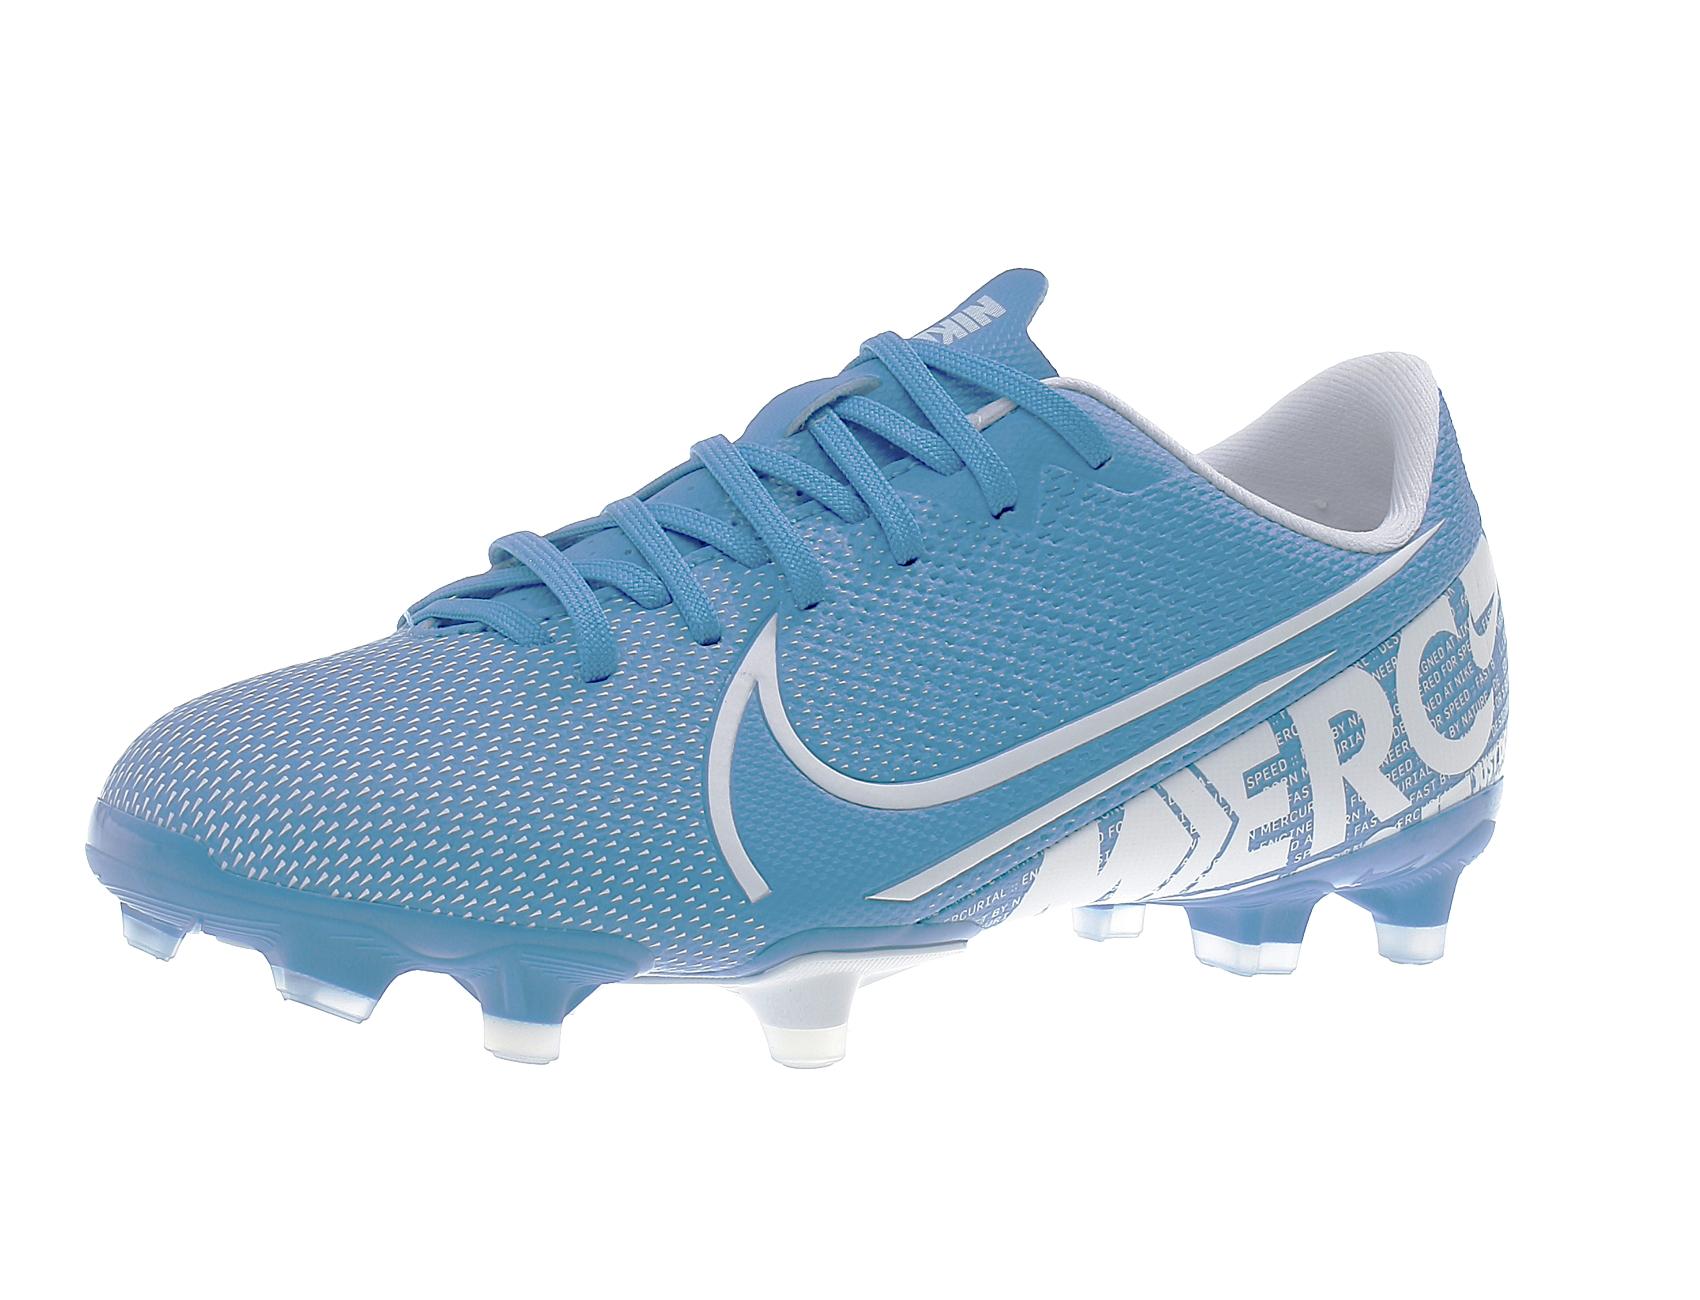 Nike Schuhe Fußball